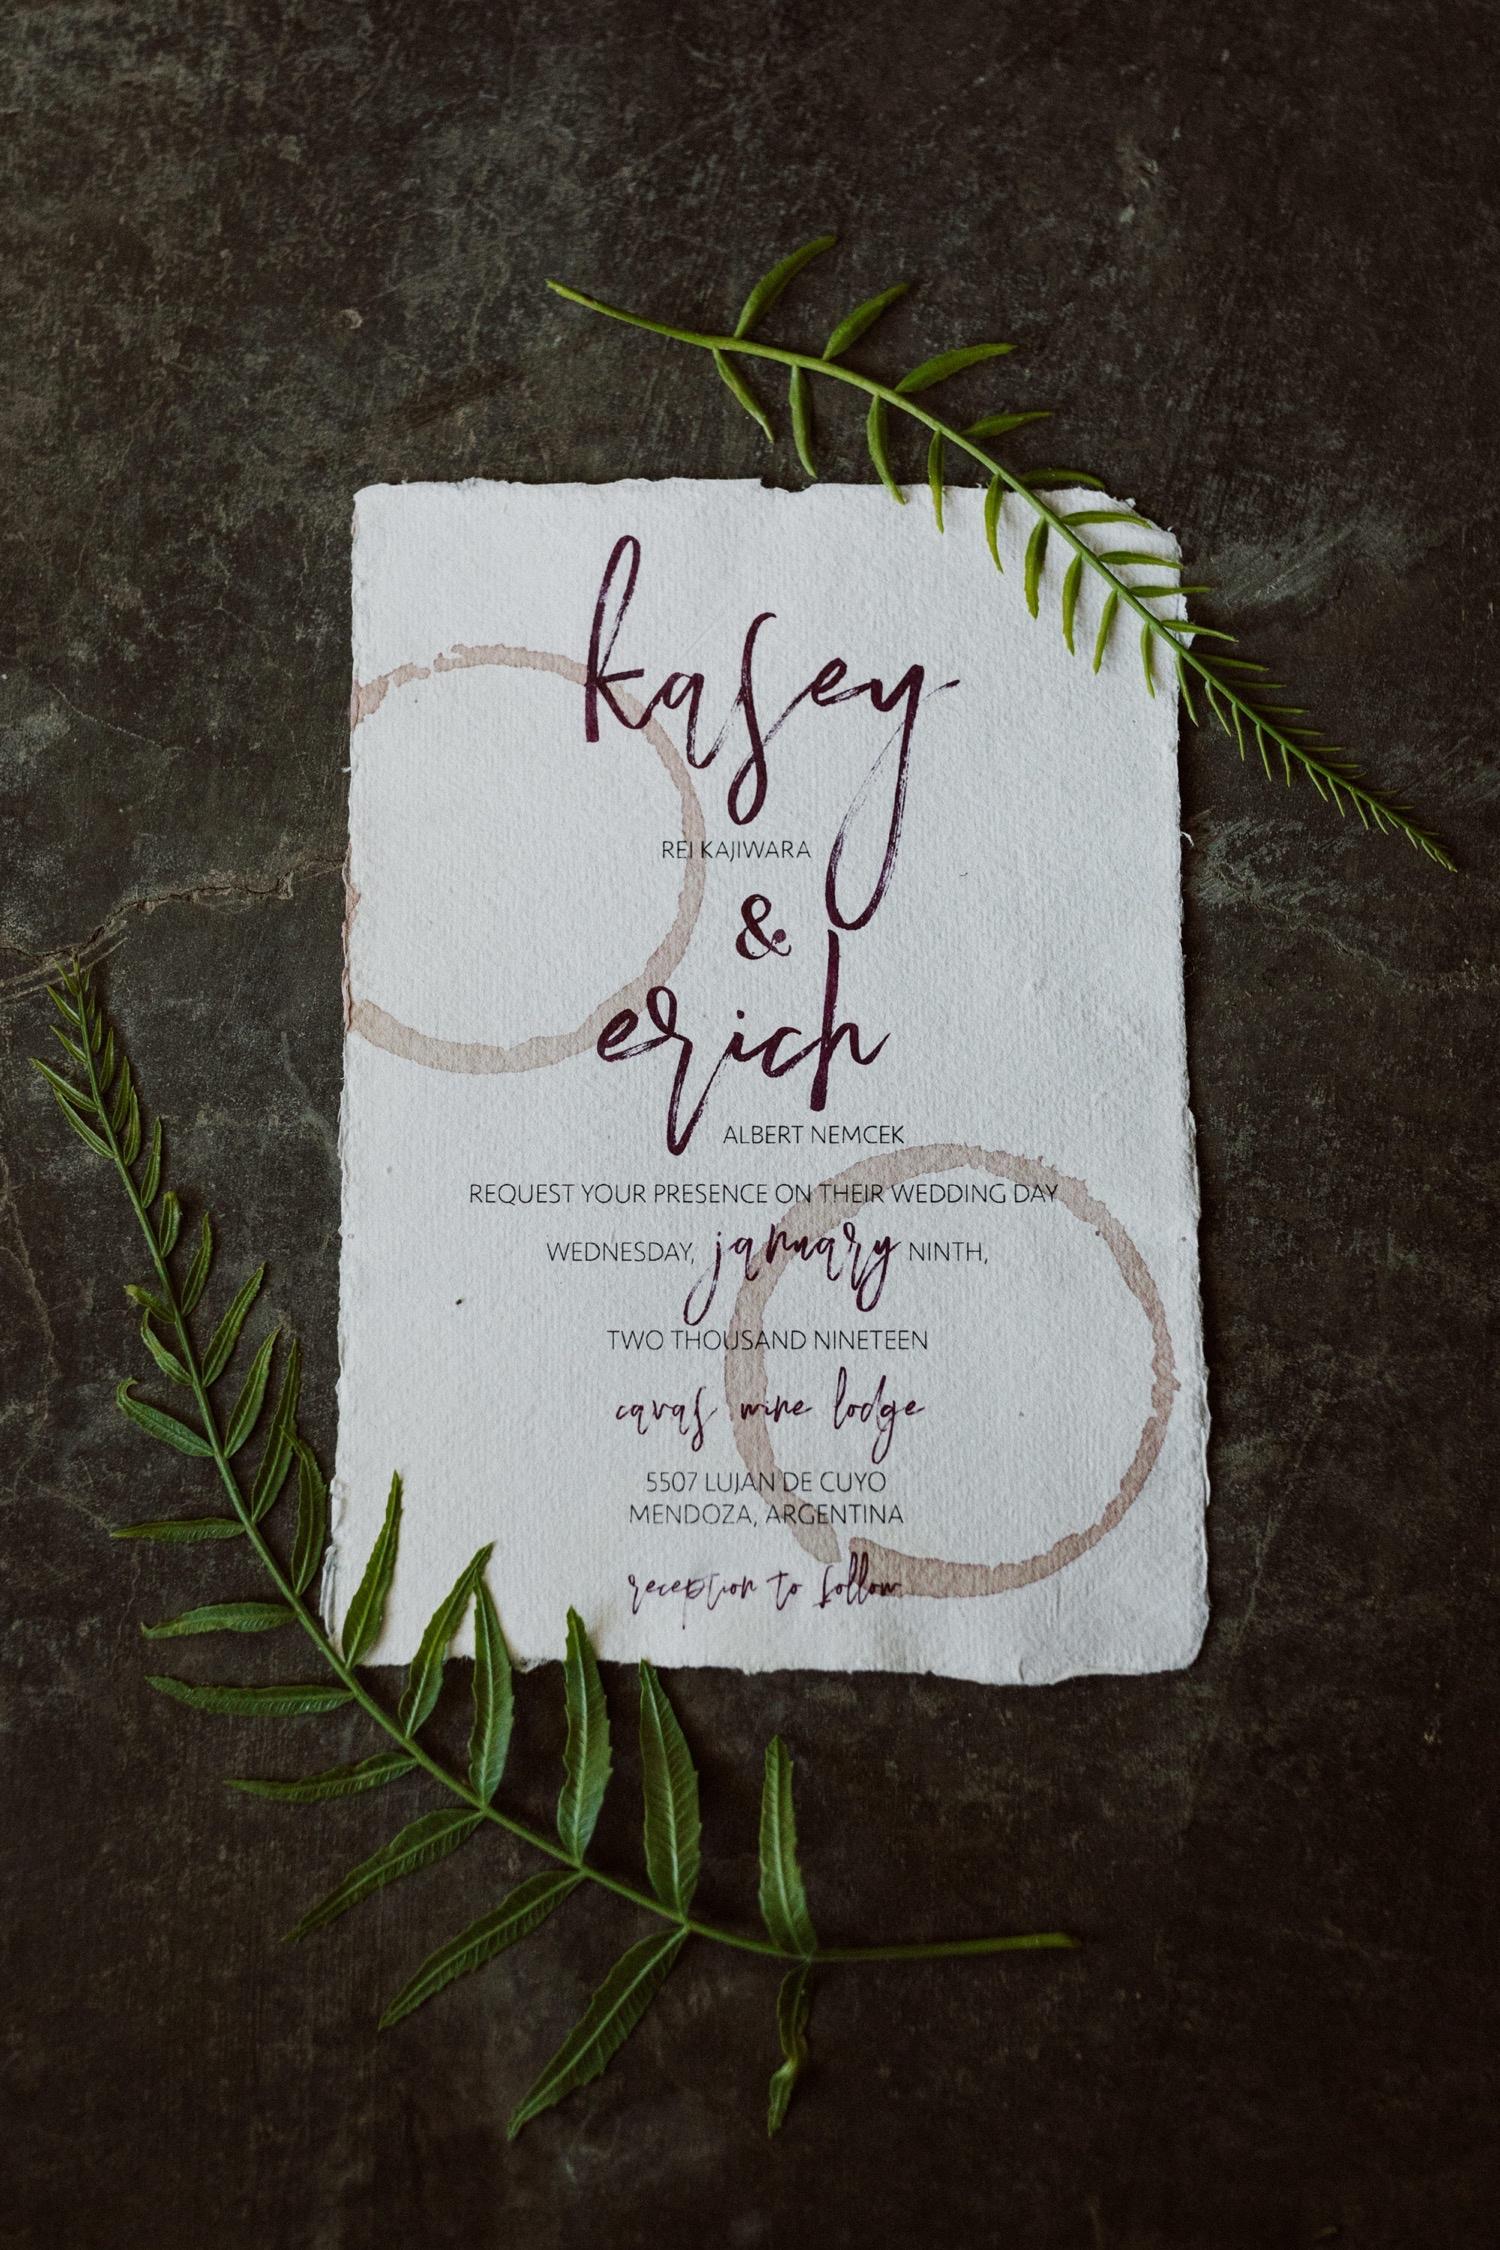 020_wedding_invitation.jpg